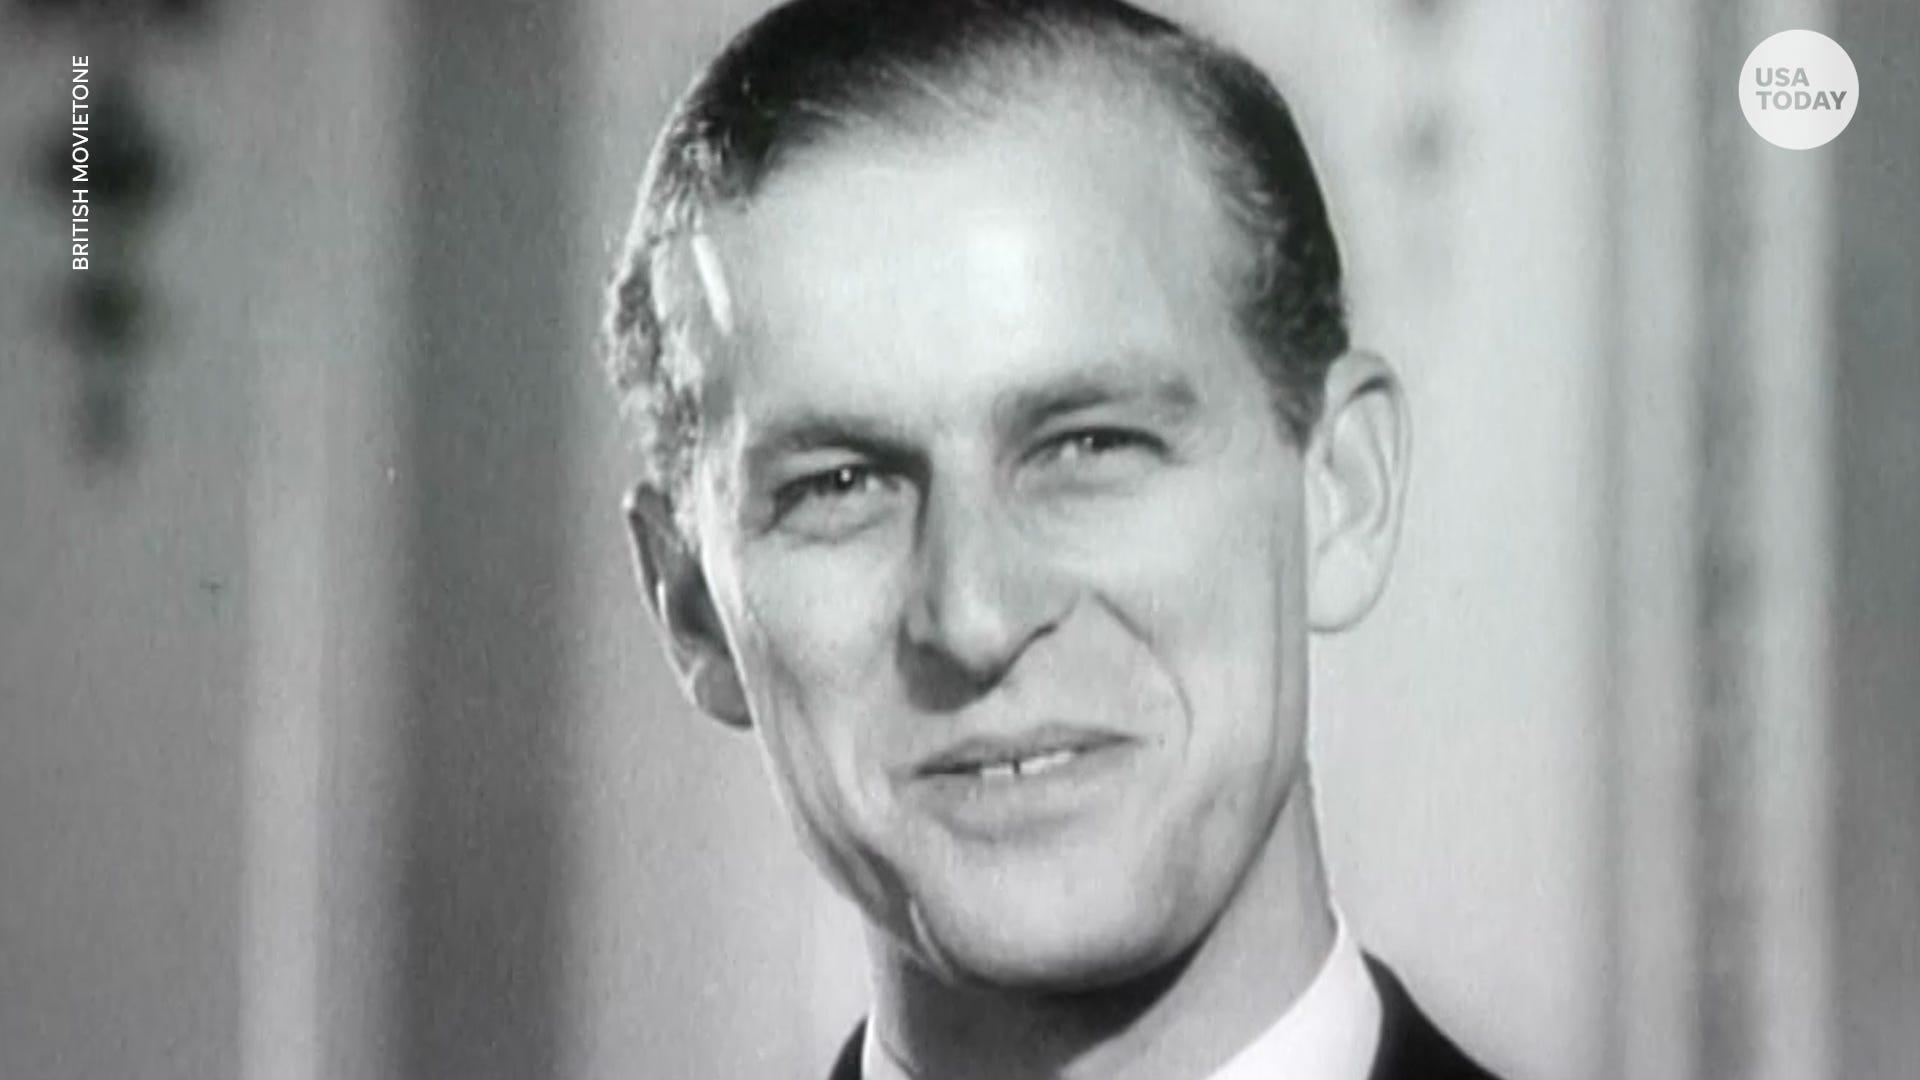 Prince Philip dies at 99: Queen Elizabeth II's husband through the years